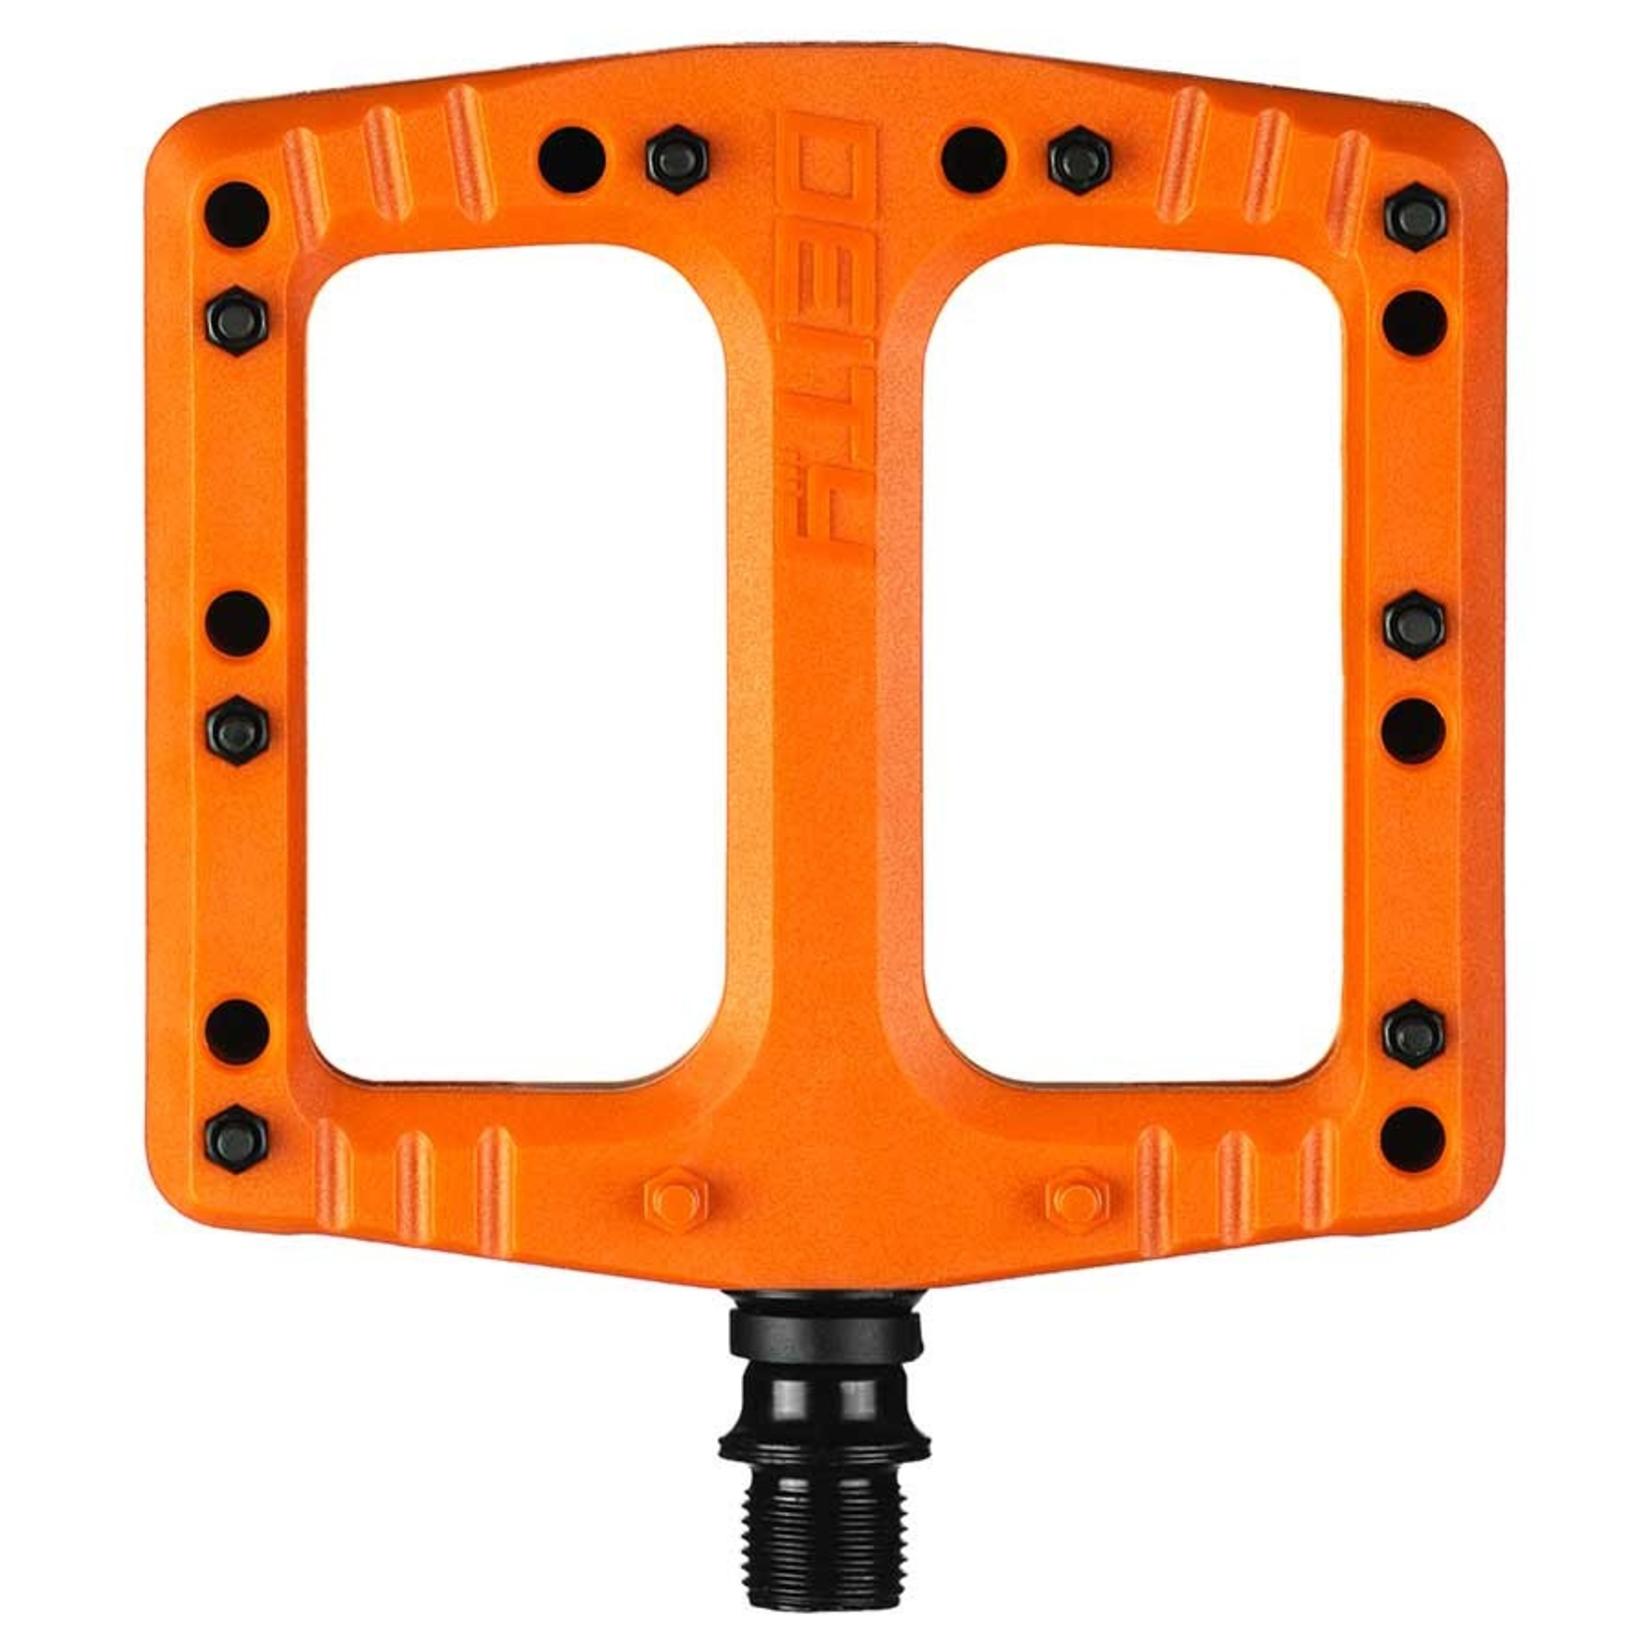 Deity Deftrap Nylon Platform Pedals